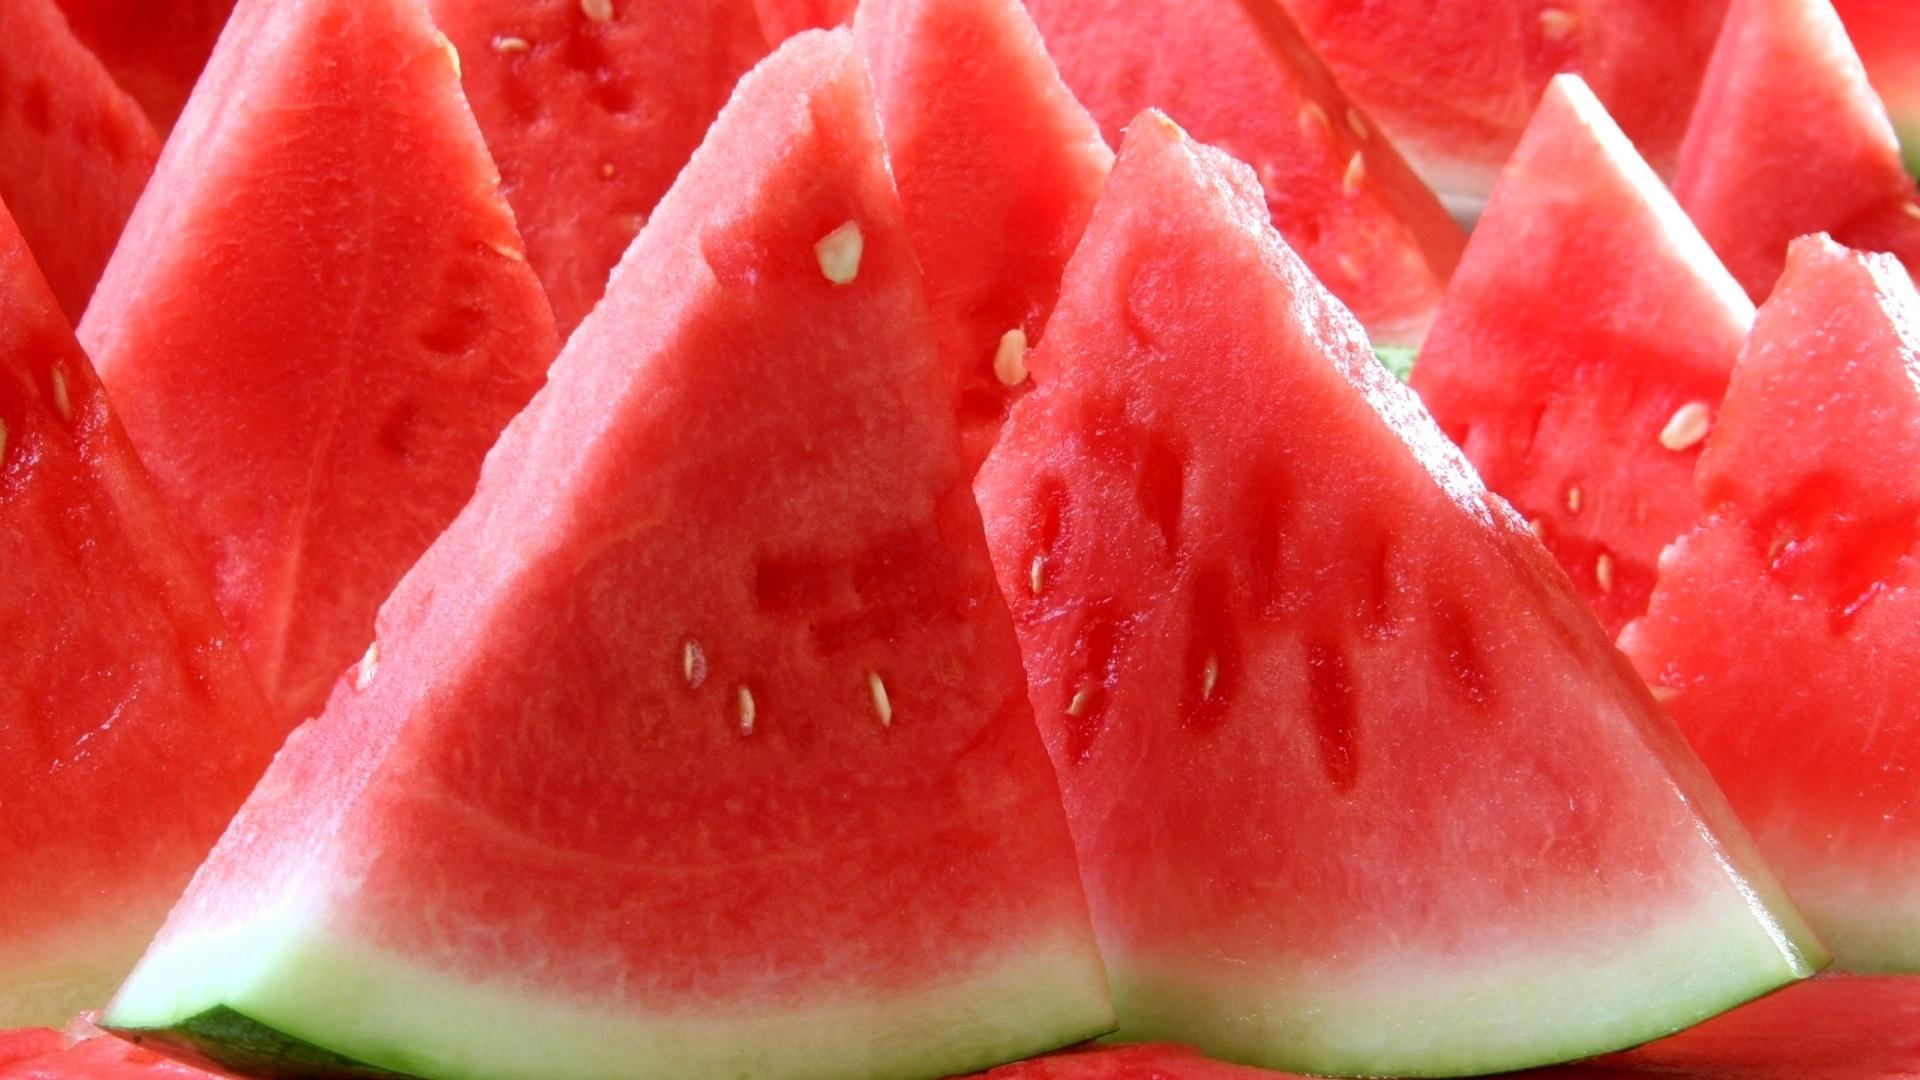 Watermelon 1080p Wallpaper